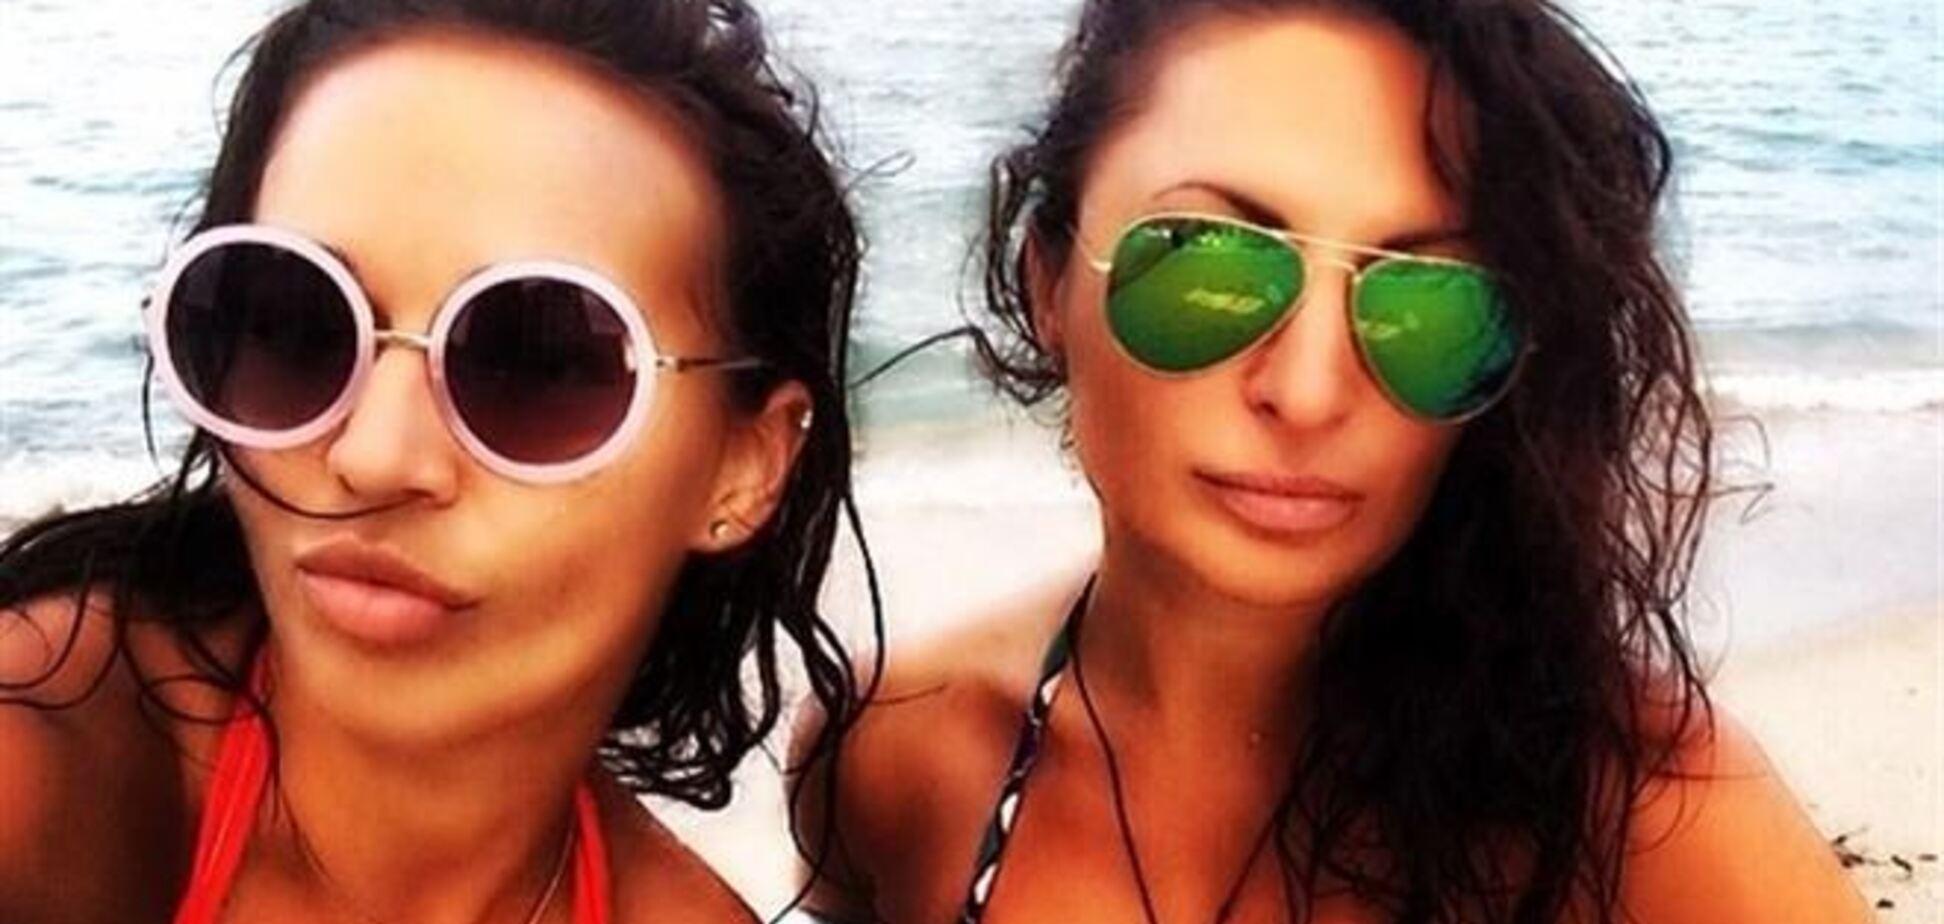 Онучка екс-прем'єра України хвалиться пляжними фото